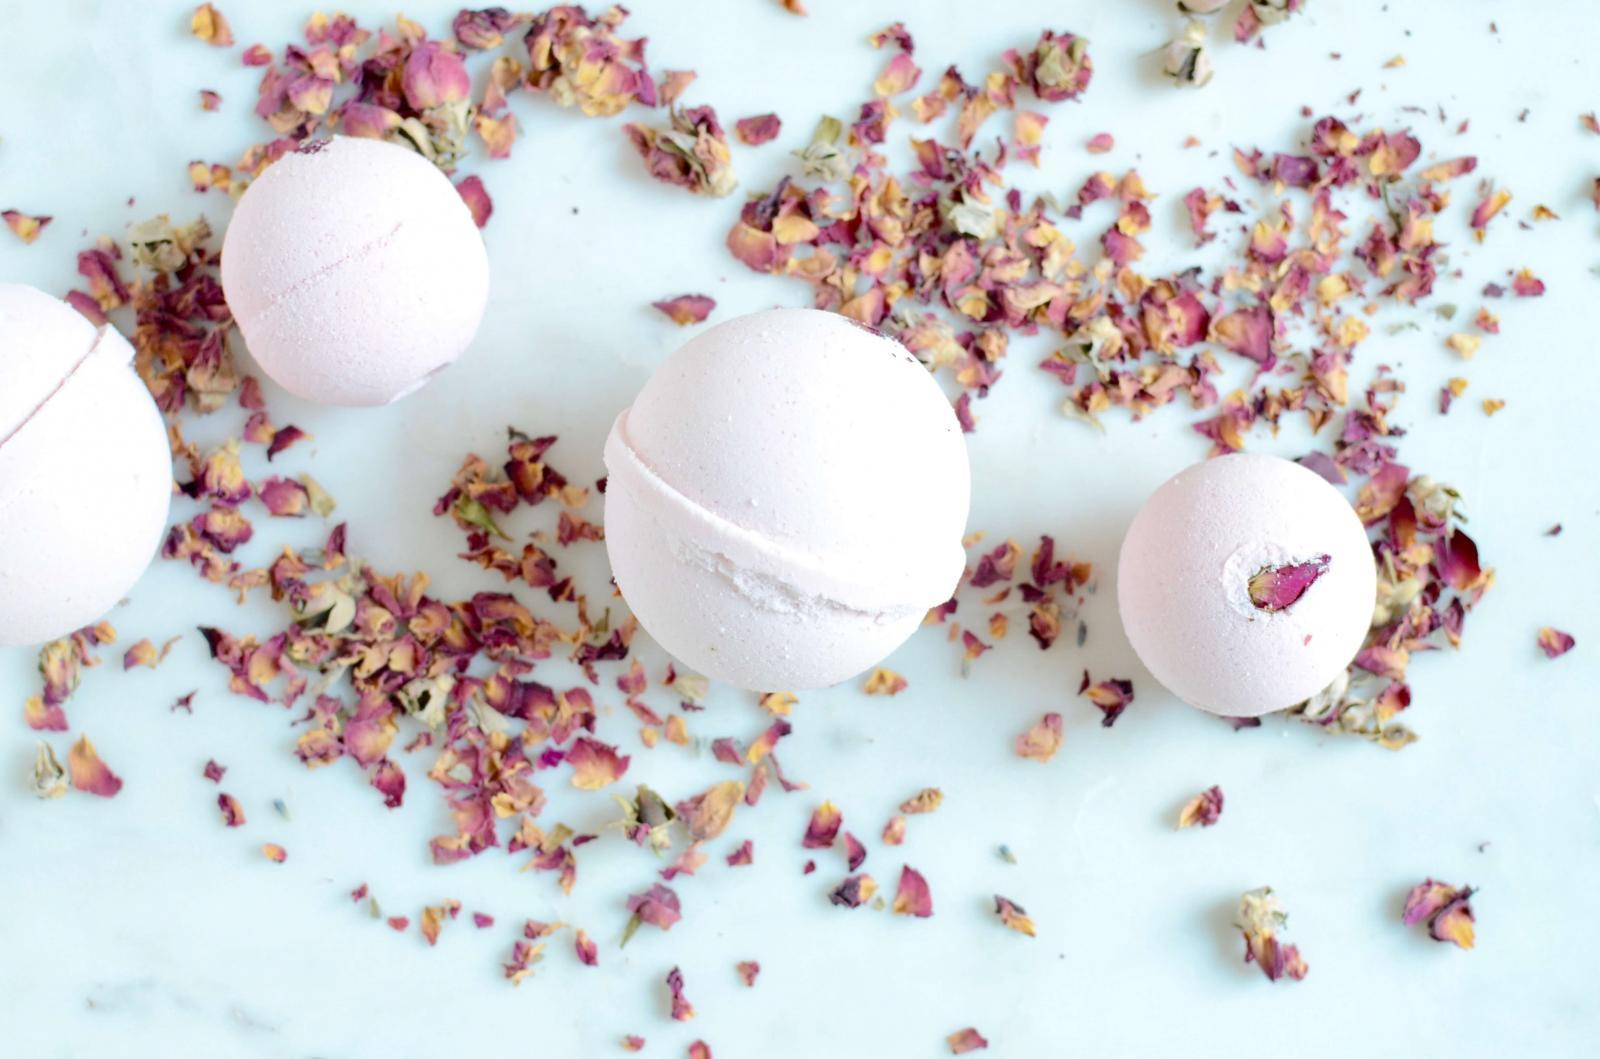 Rose Aromatherapy Bath Bomb